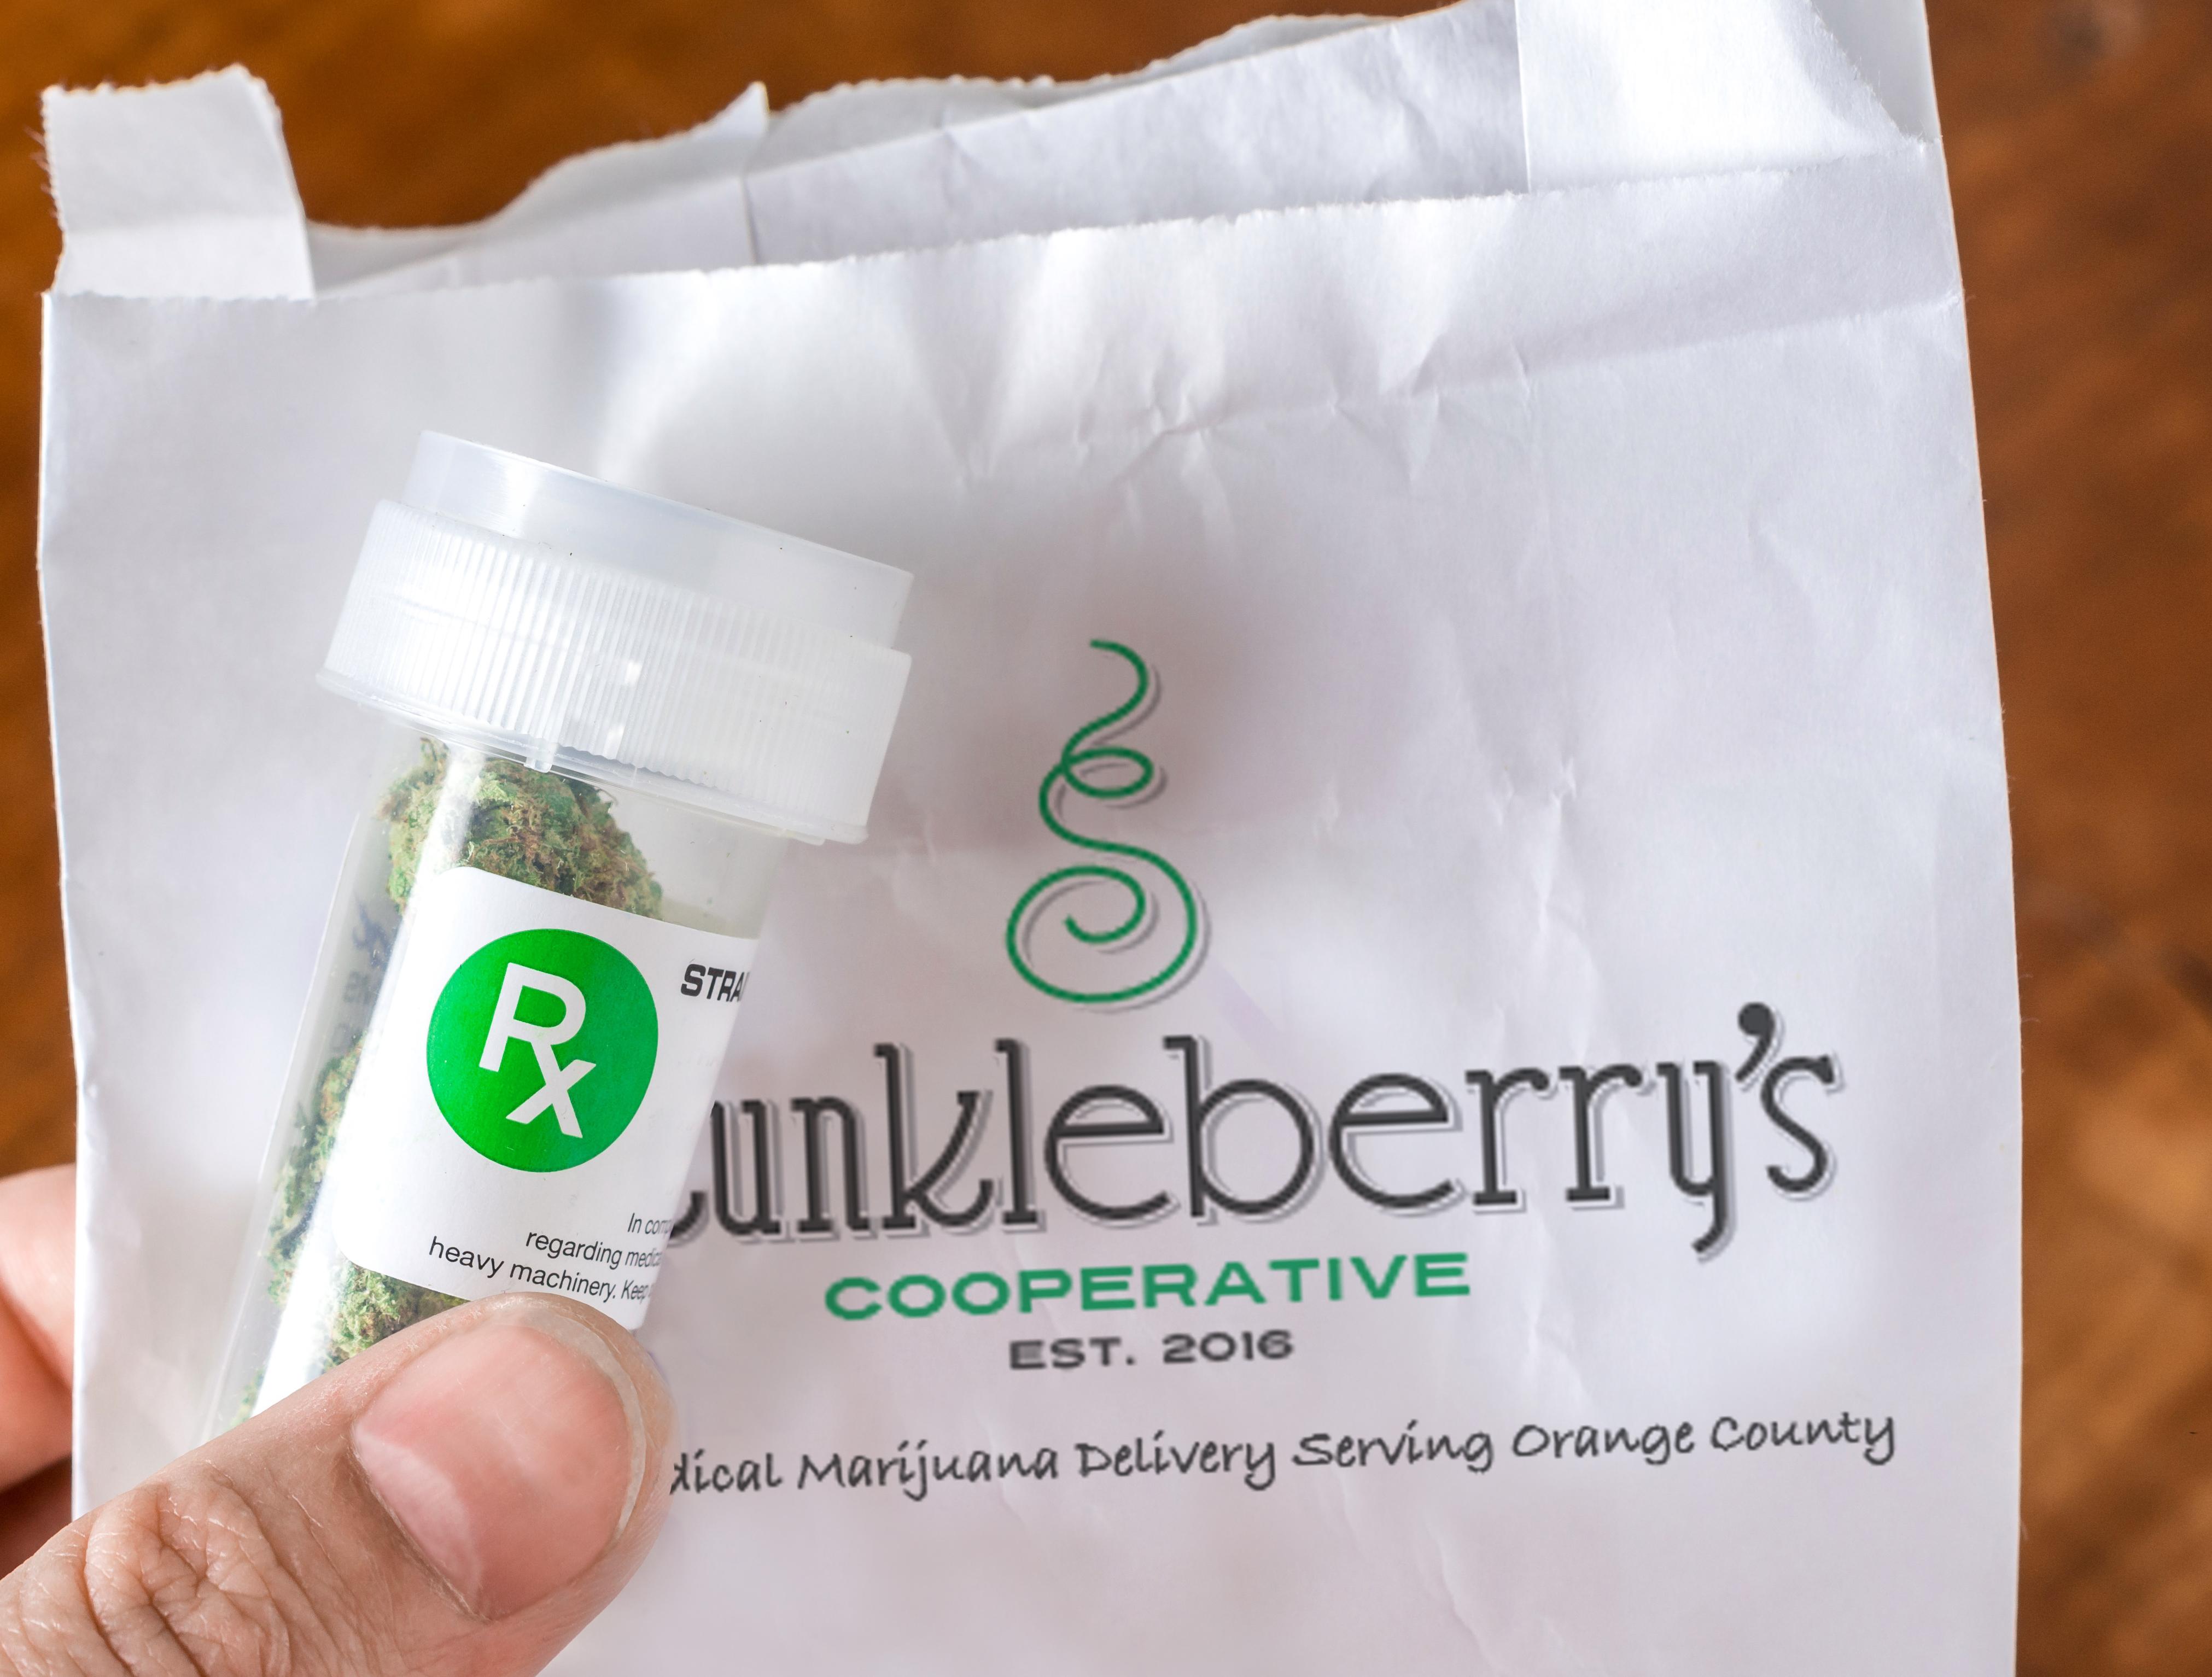 Skunkleberry's • Brand Development